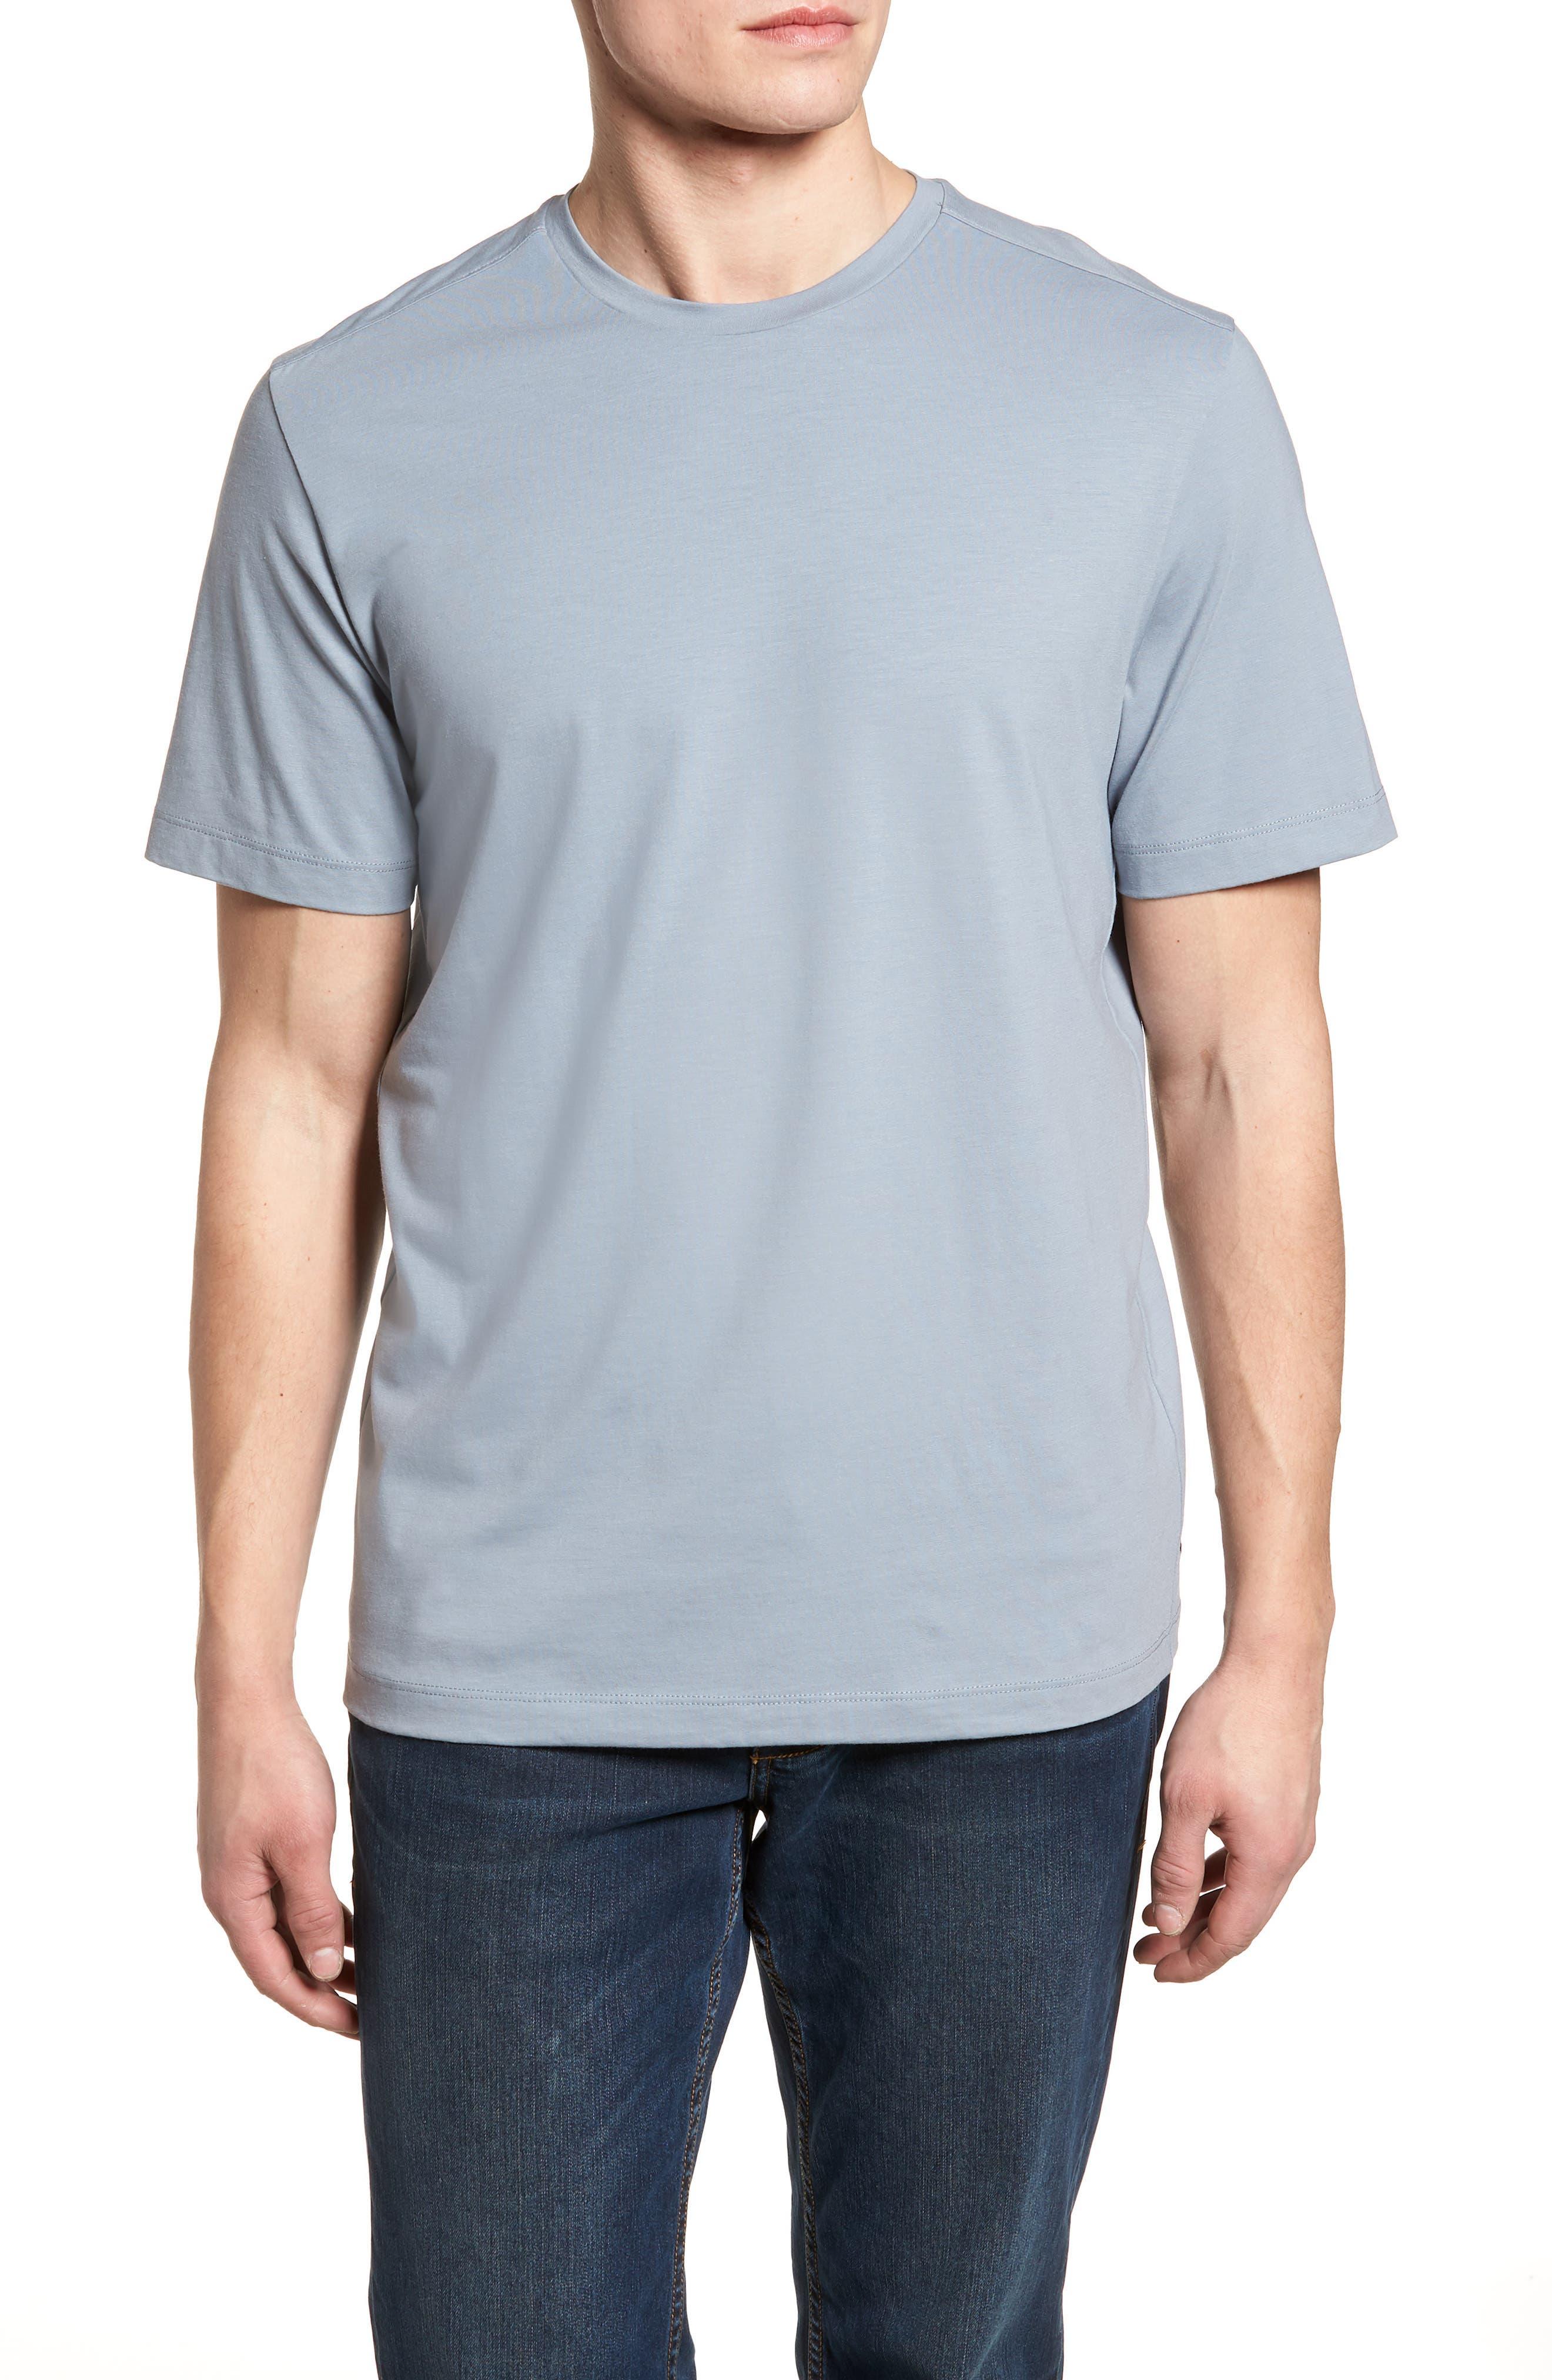 Tropicool T-Shirt,                         Main,                         color, 050